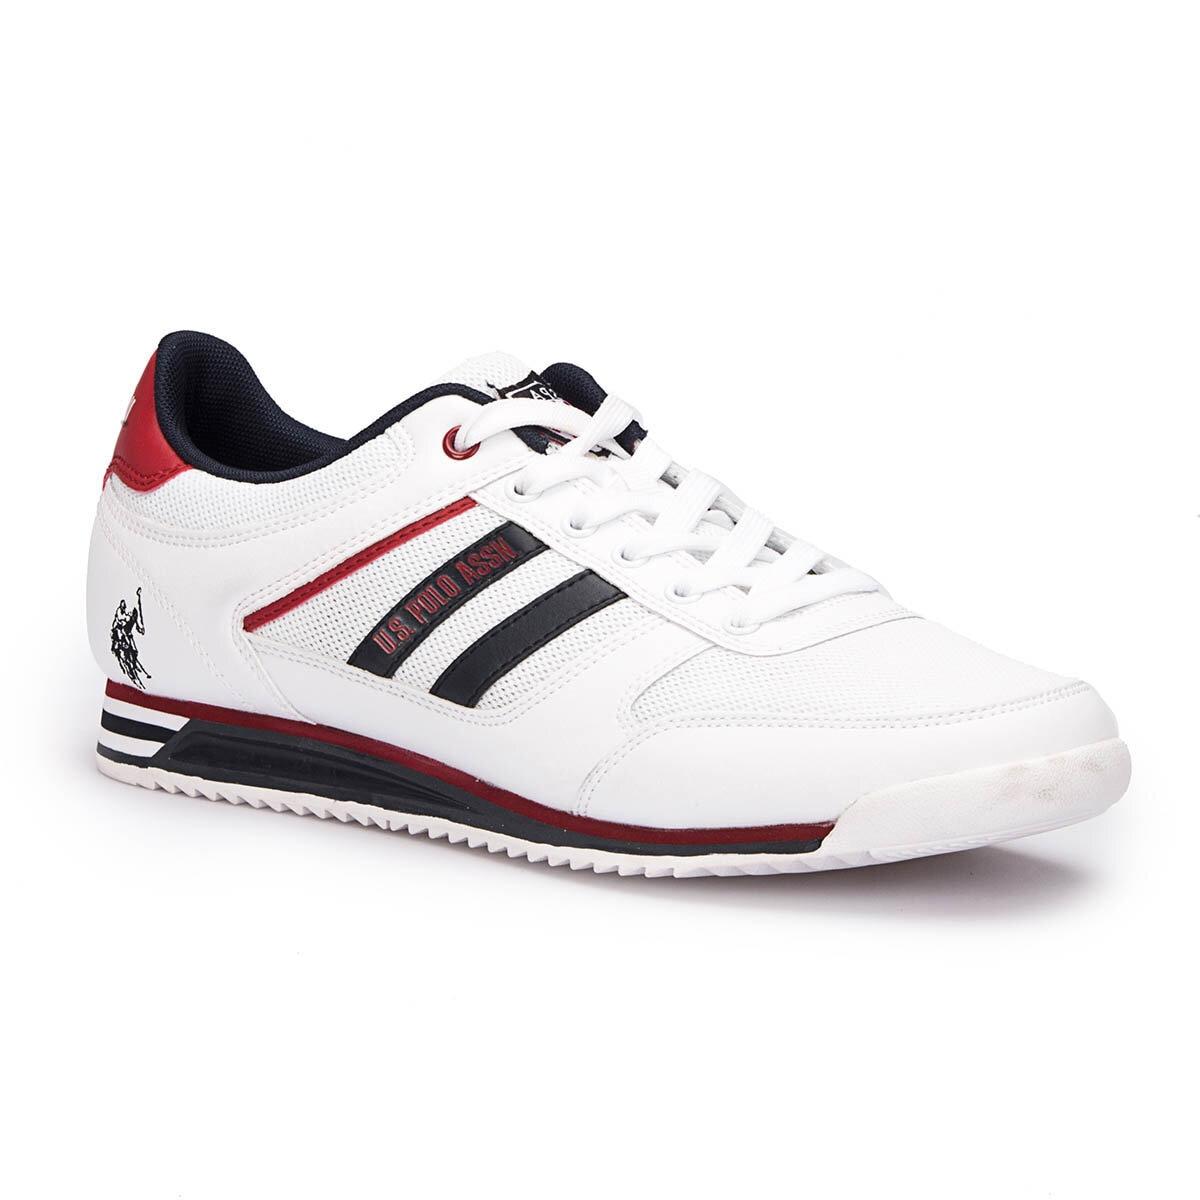 FLO KENY White Men 'S Sneaker Shoes U.S. POLO ASSN.